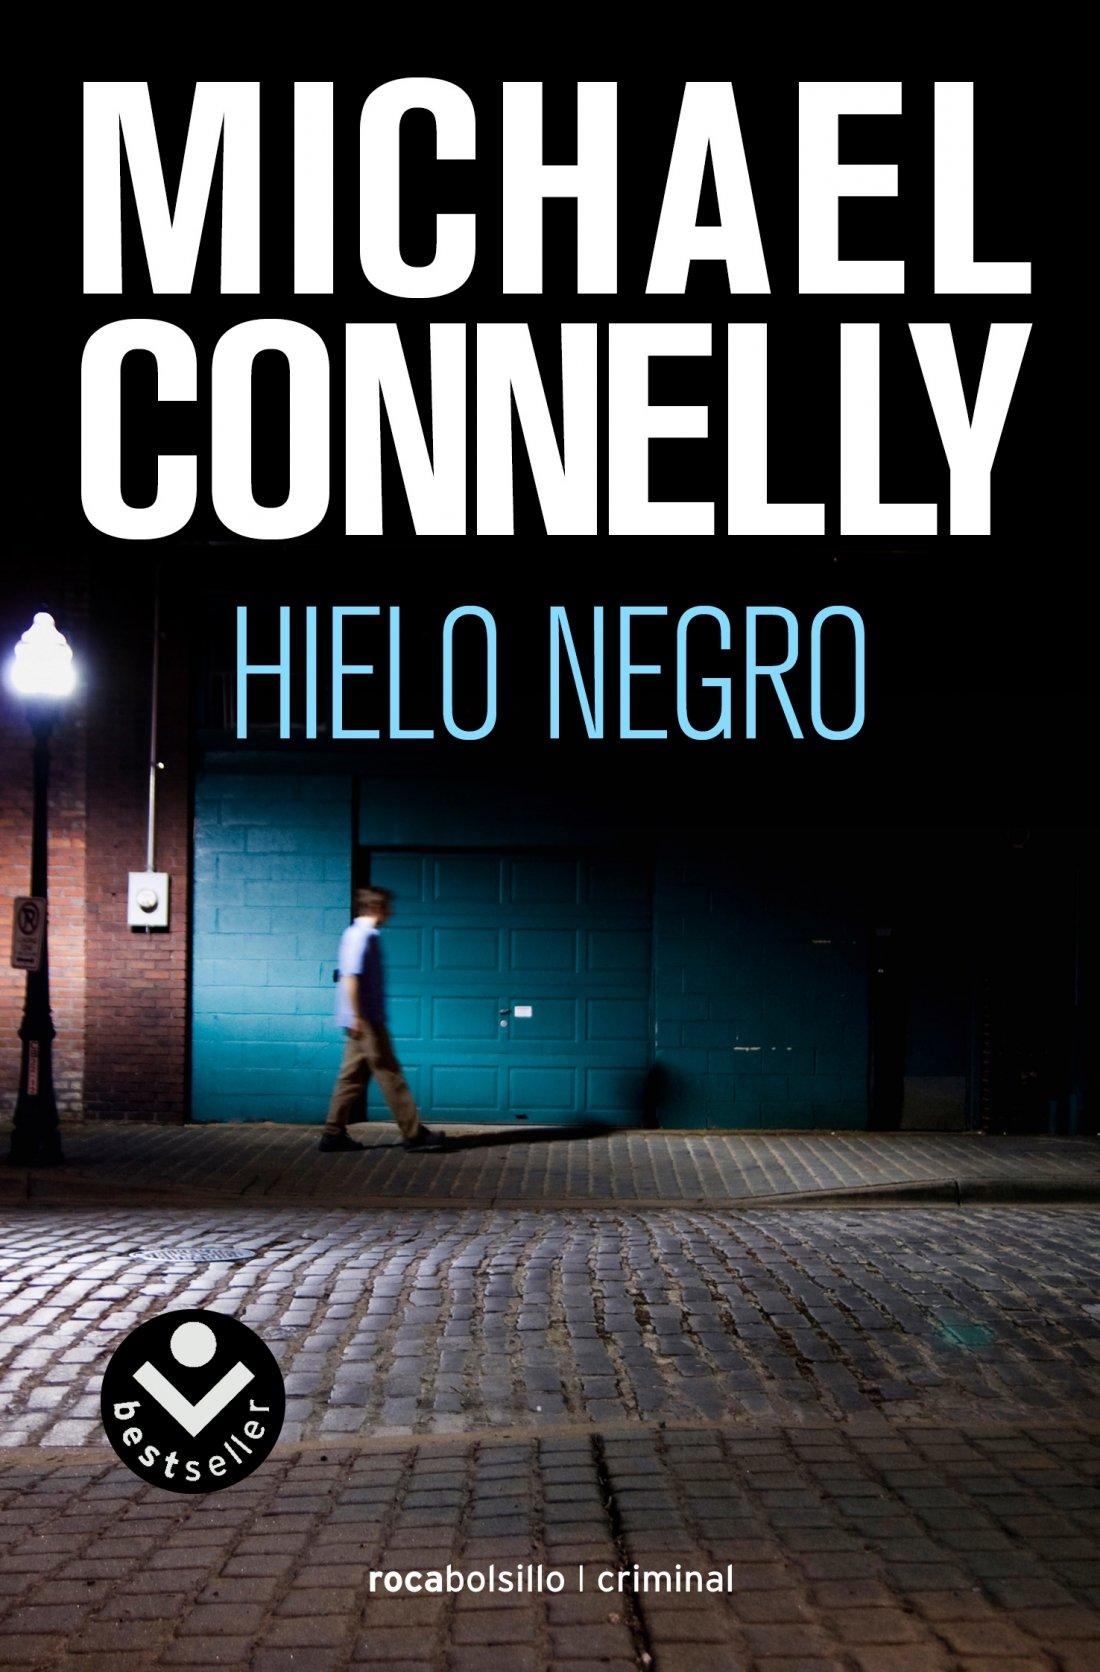 Hielo negro (Harry Bosch) (Spanish Edition): Michael Connelly:  9788496940819: Amazon.com: Books